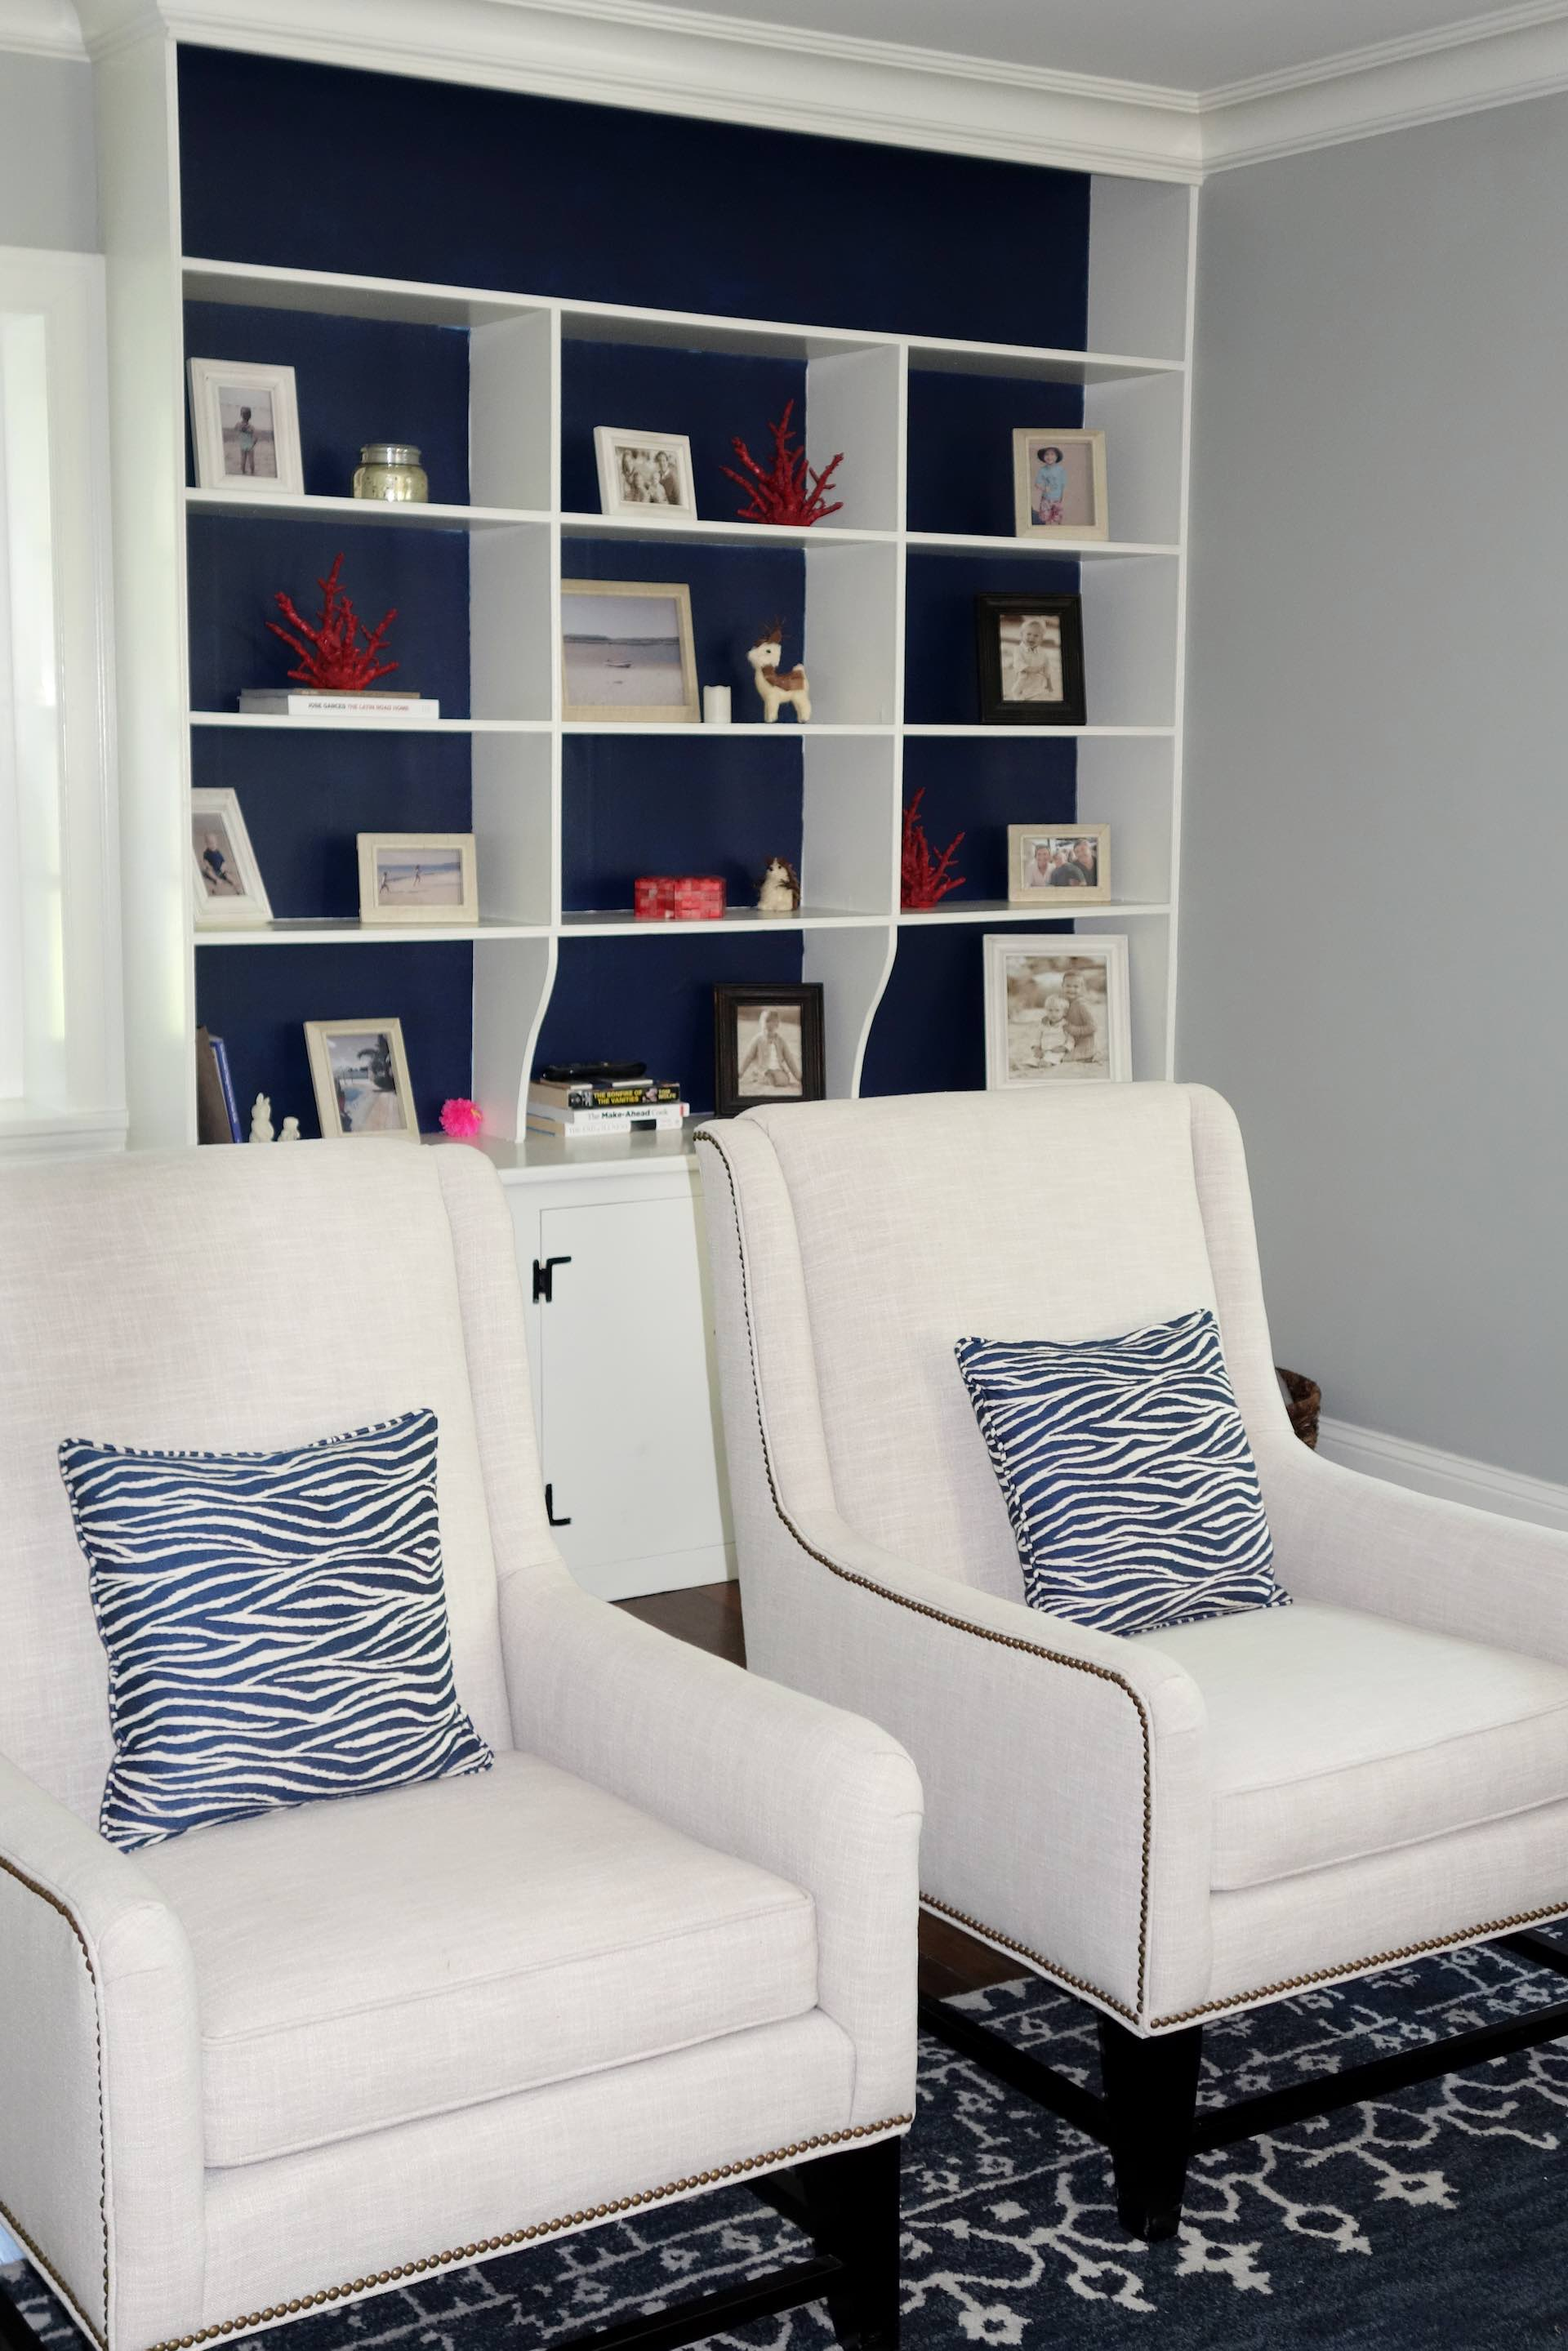 sofa seatas.jpg